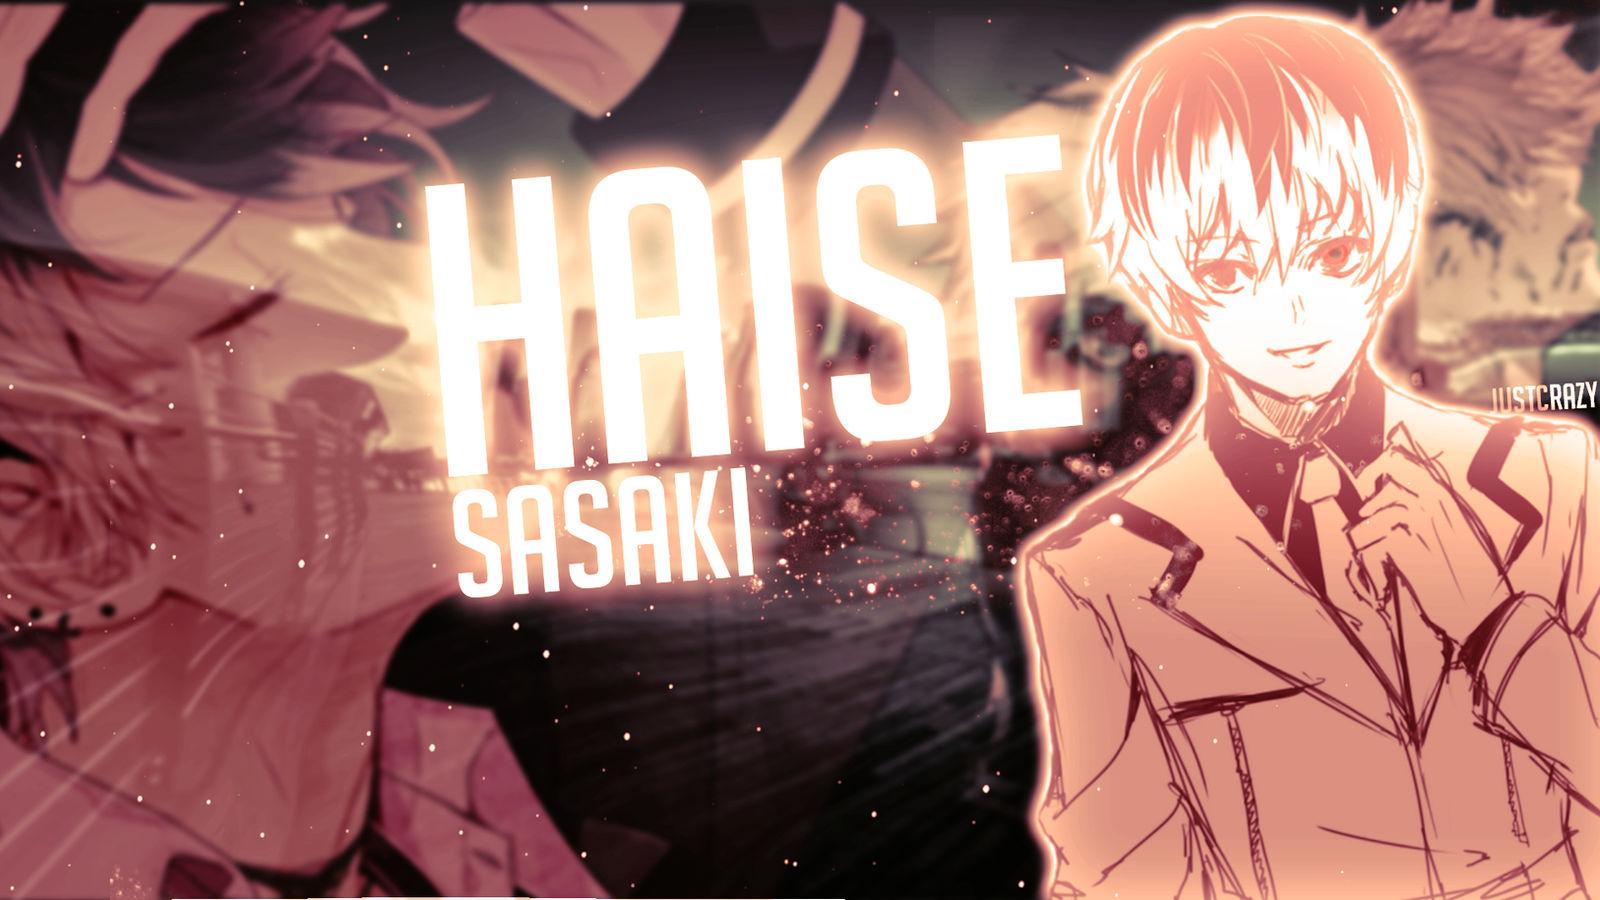 Haise Sasaki Wallpaper By Pxlrfx On Deviantart